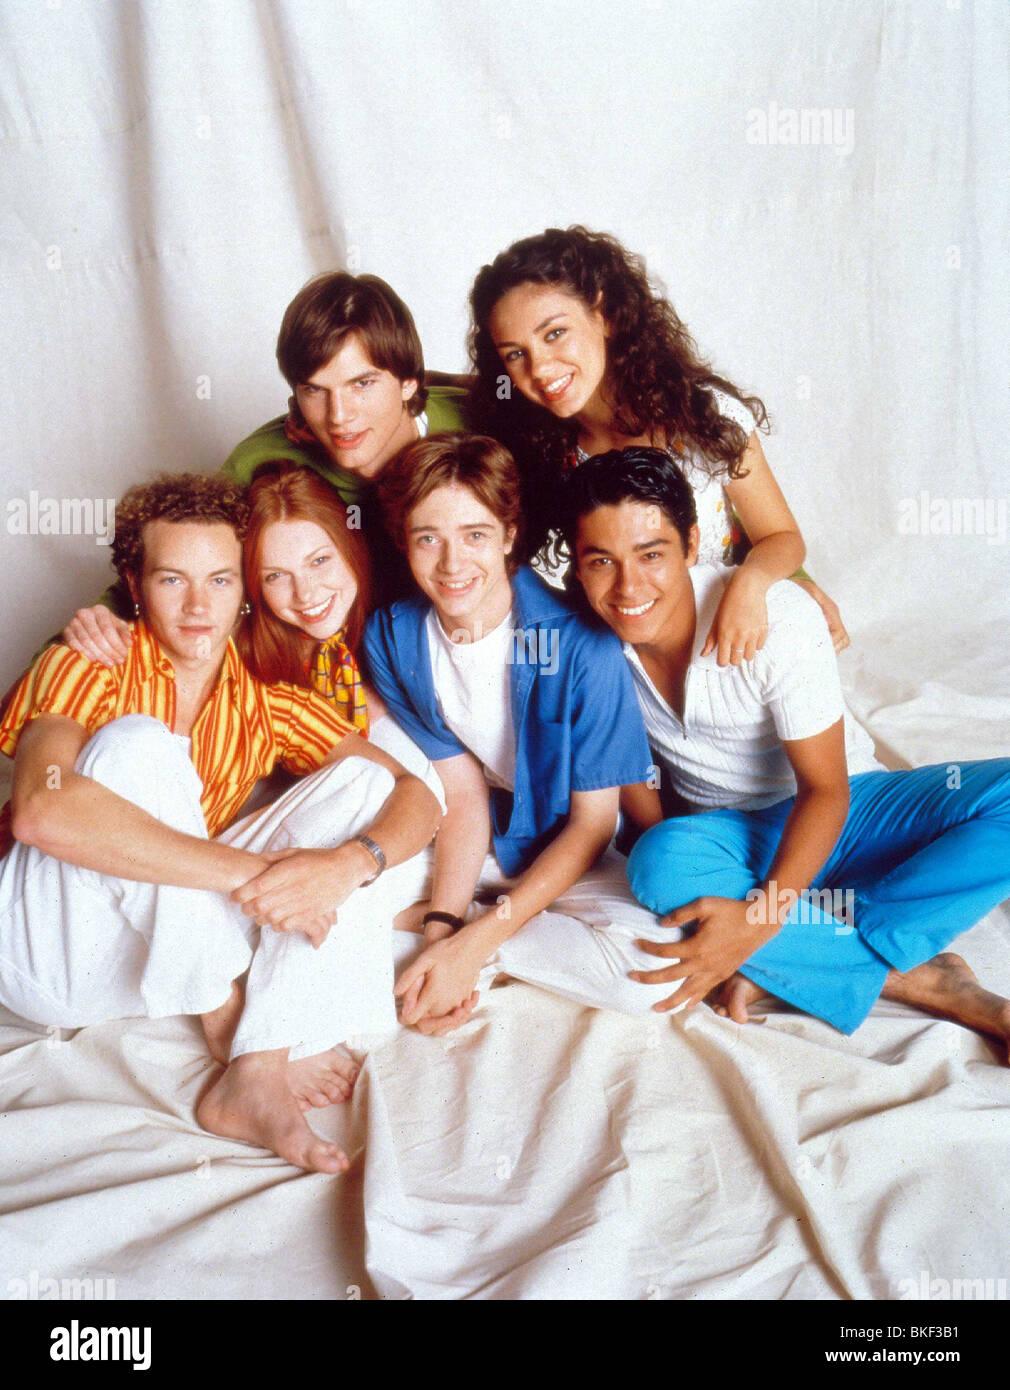 Che 70'S SHOW (TV - 1998) DANNY MASTERSON, LAURA PREPON, Ashton Kutcher, Topher Grace, Mila Kunis, WILMER VALDERAMA Immagini Stock